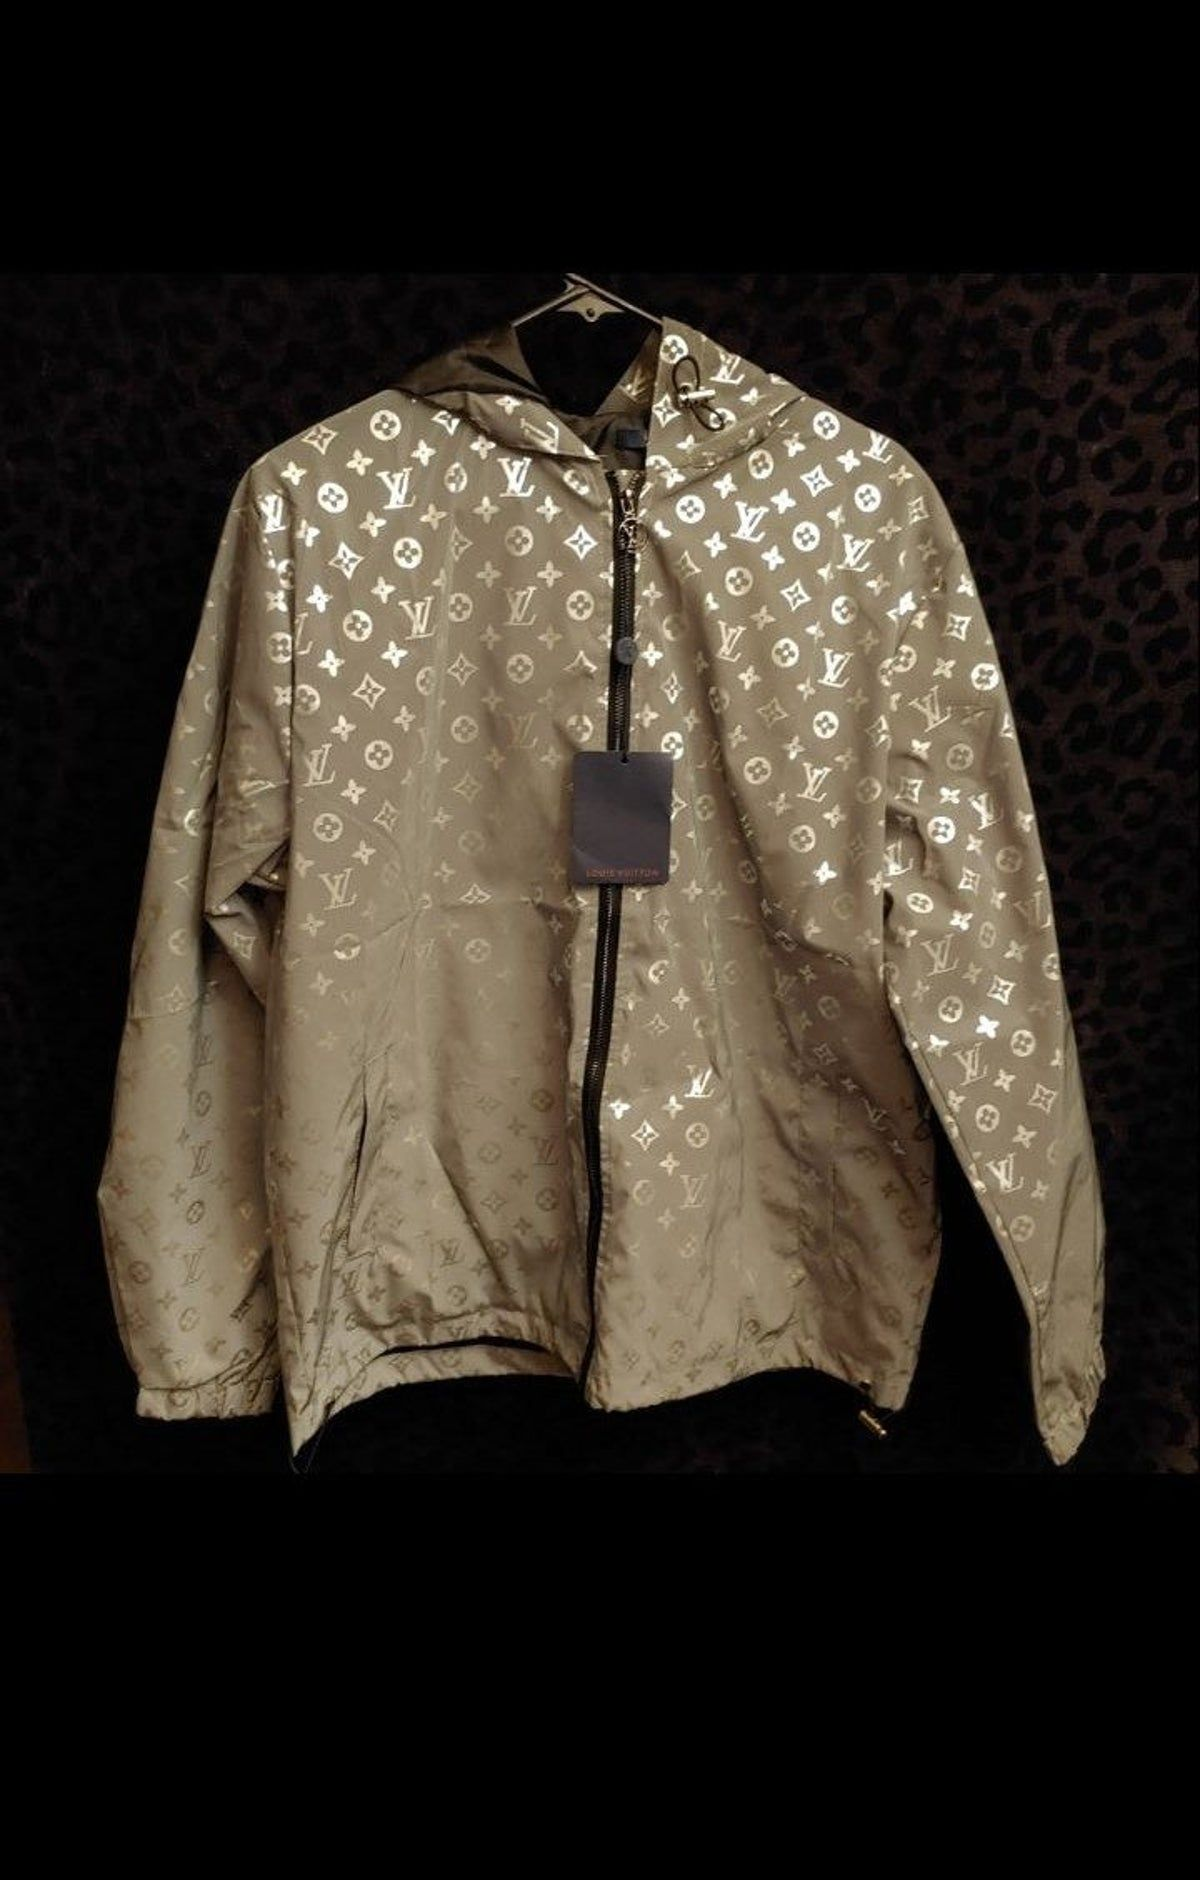 L reflective jacket streetwear fashion women tomboy